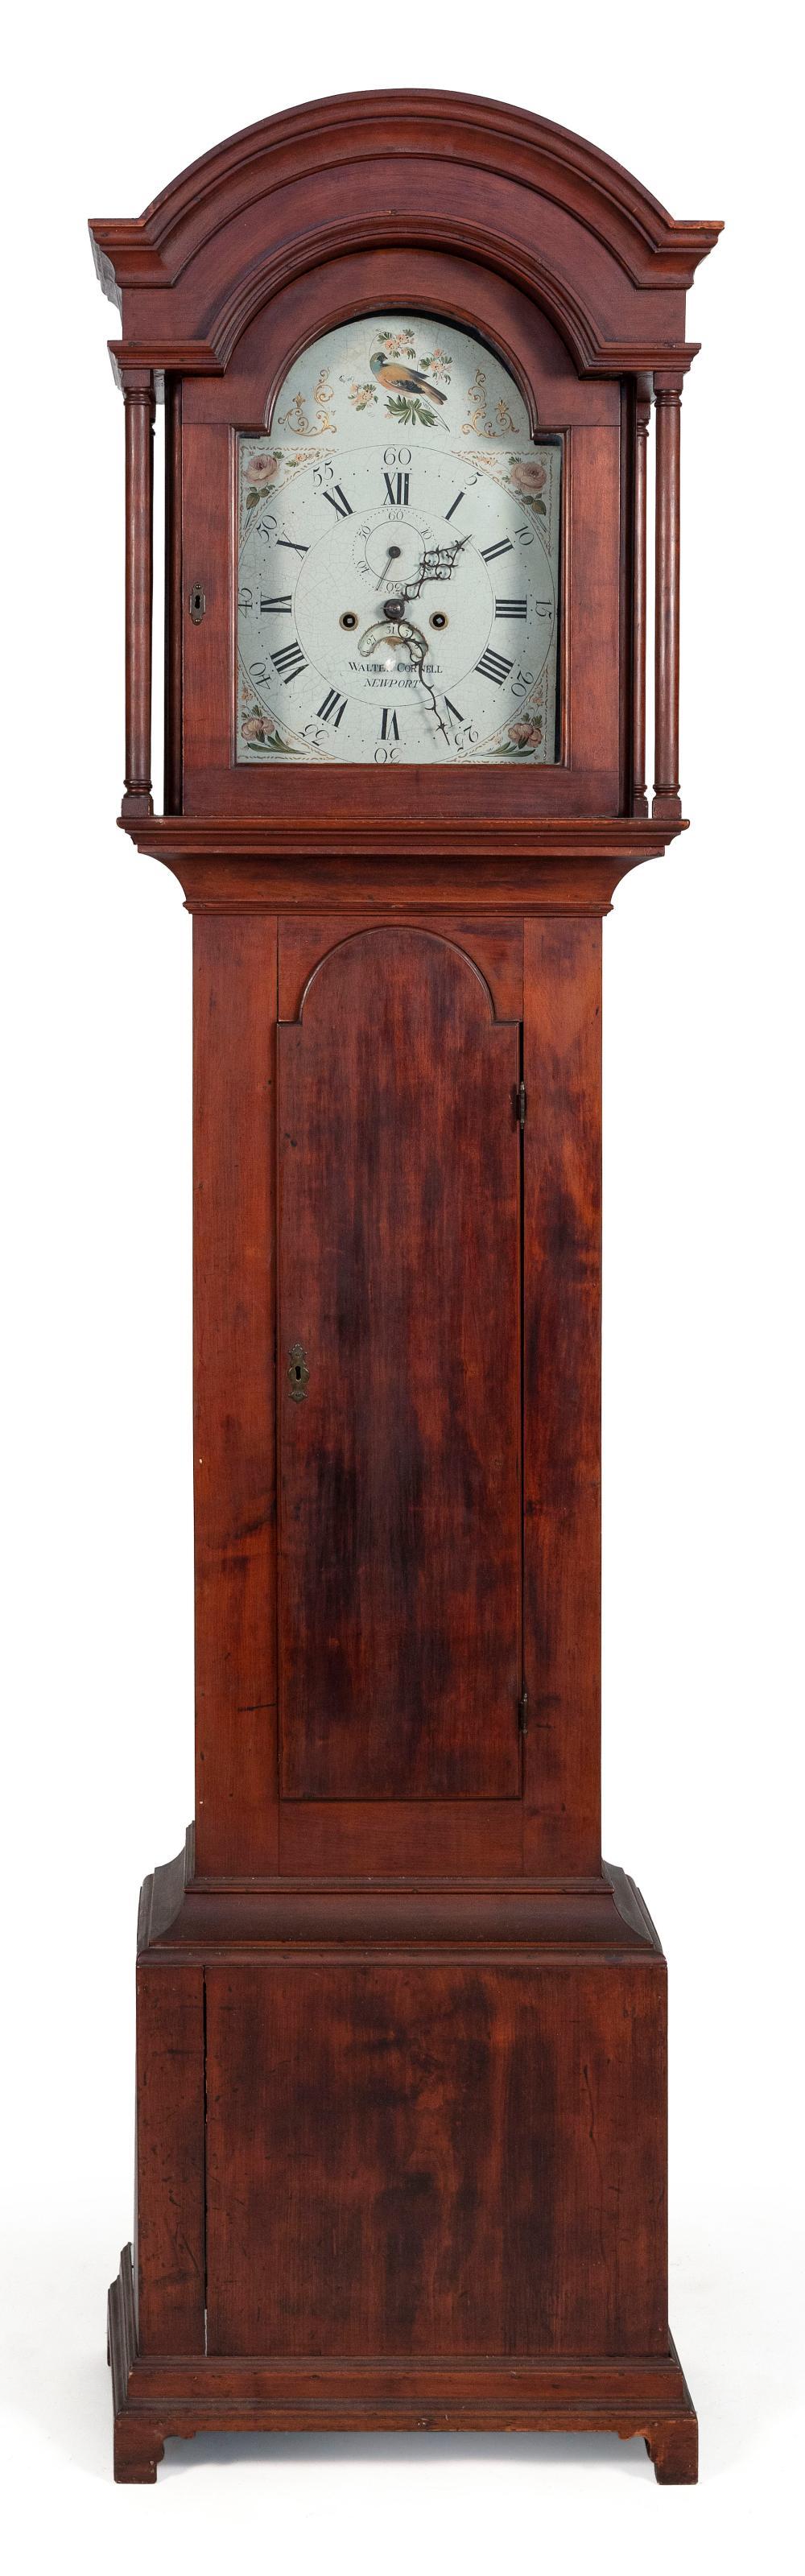 "WALTER CORNELL TALL-CASE CLOCK Newport, Rhode Island, Early 19th Century Height 85.5"". Width 19.25"". Depth 10.75""."